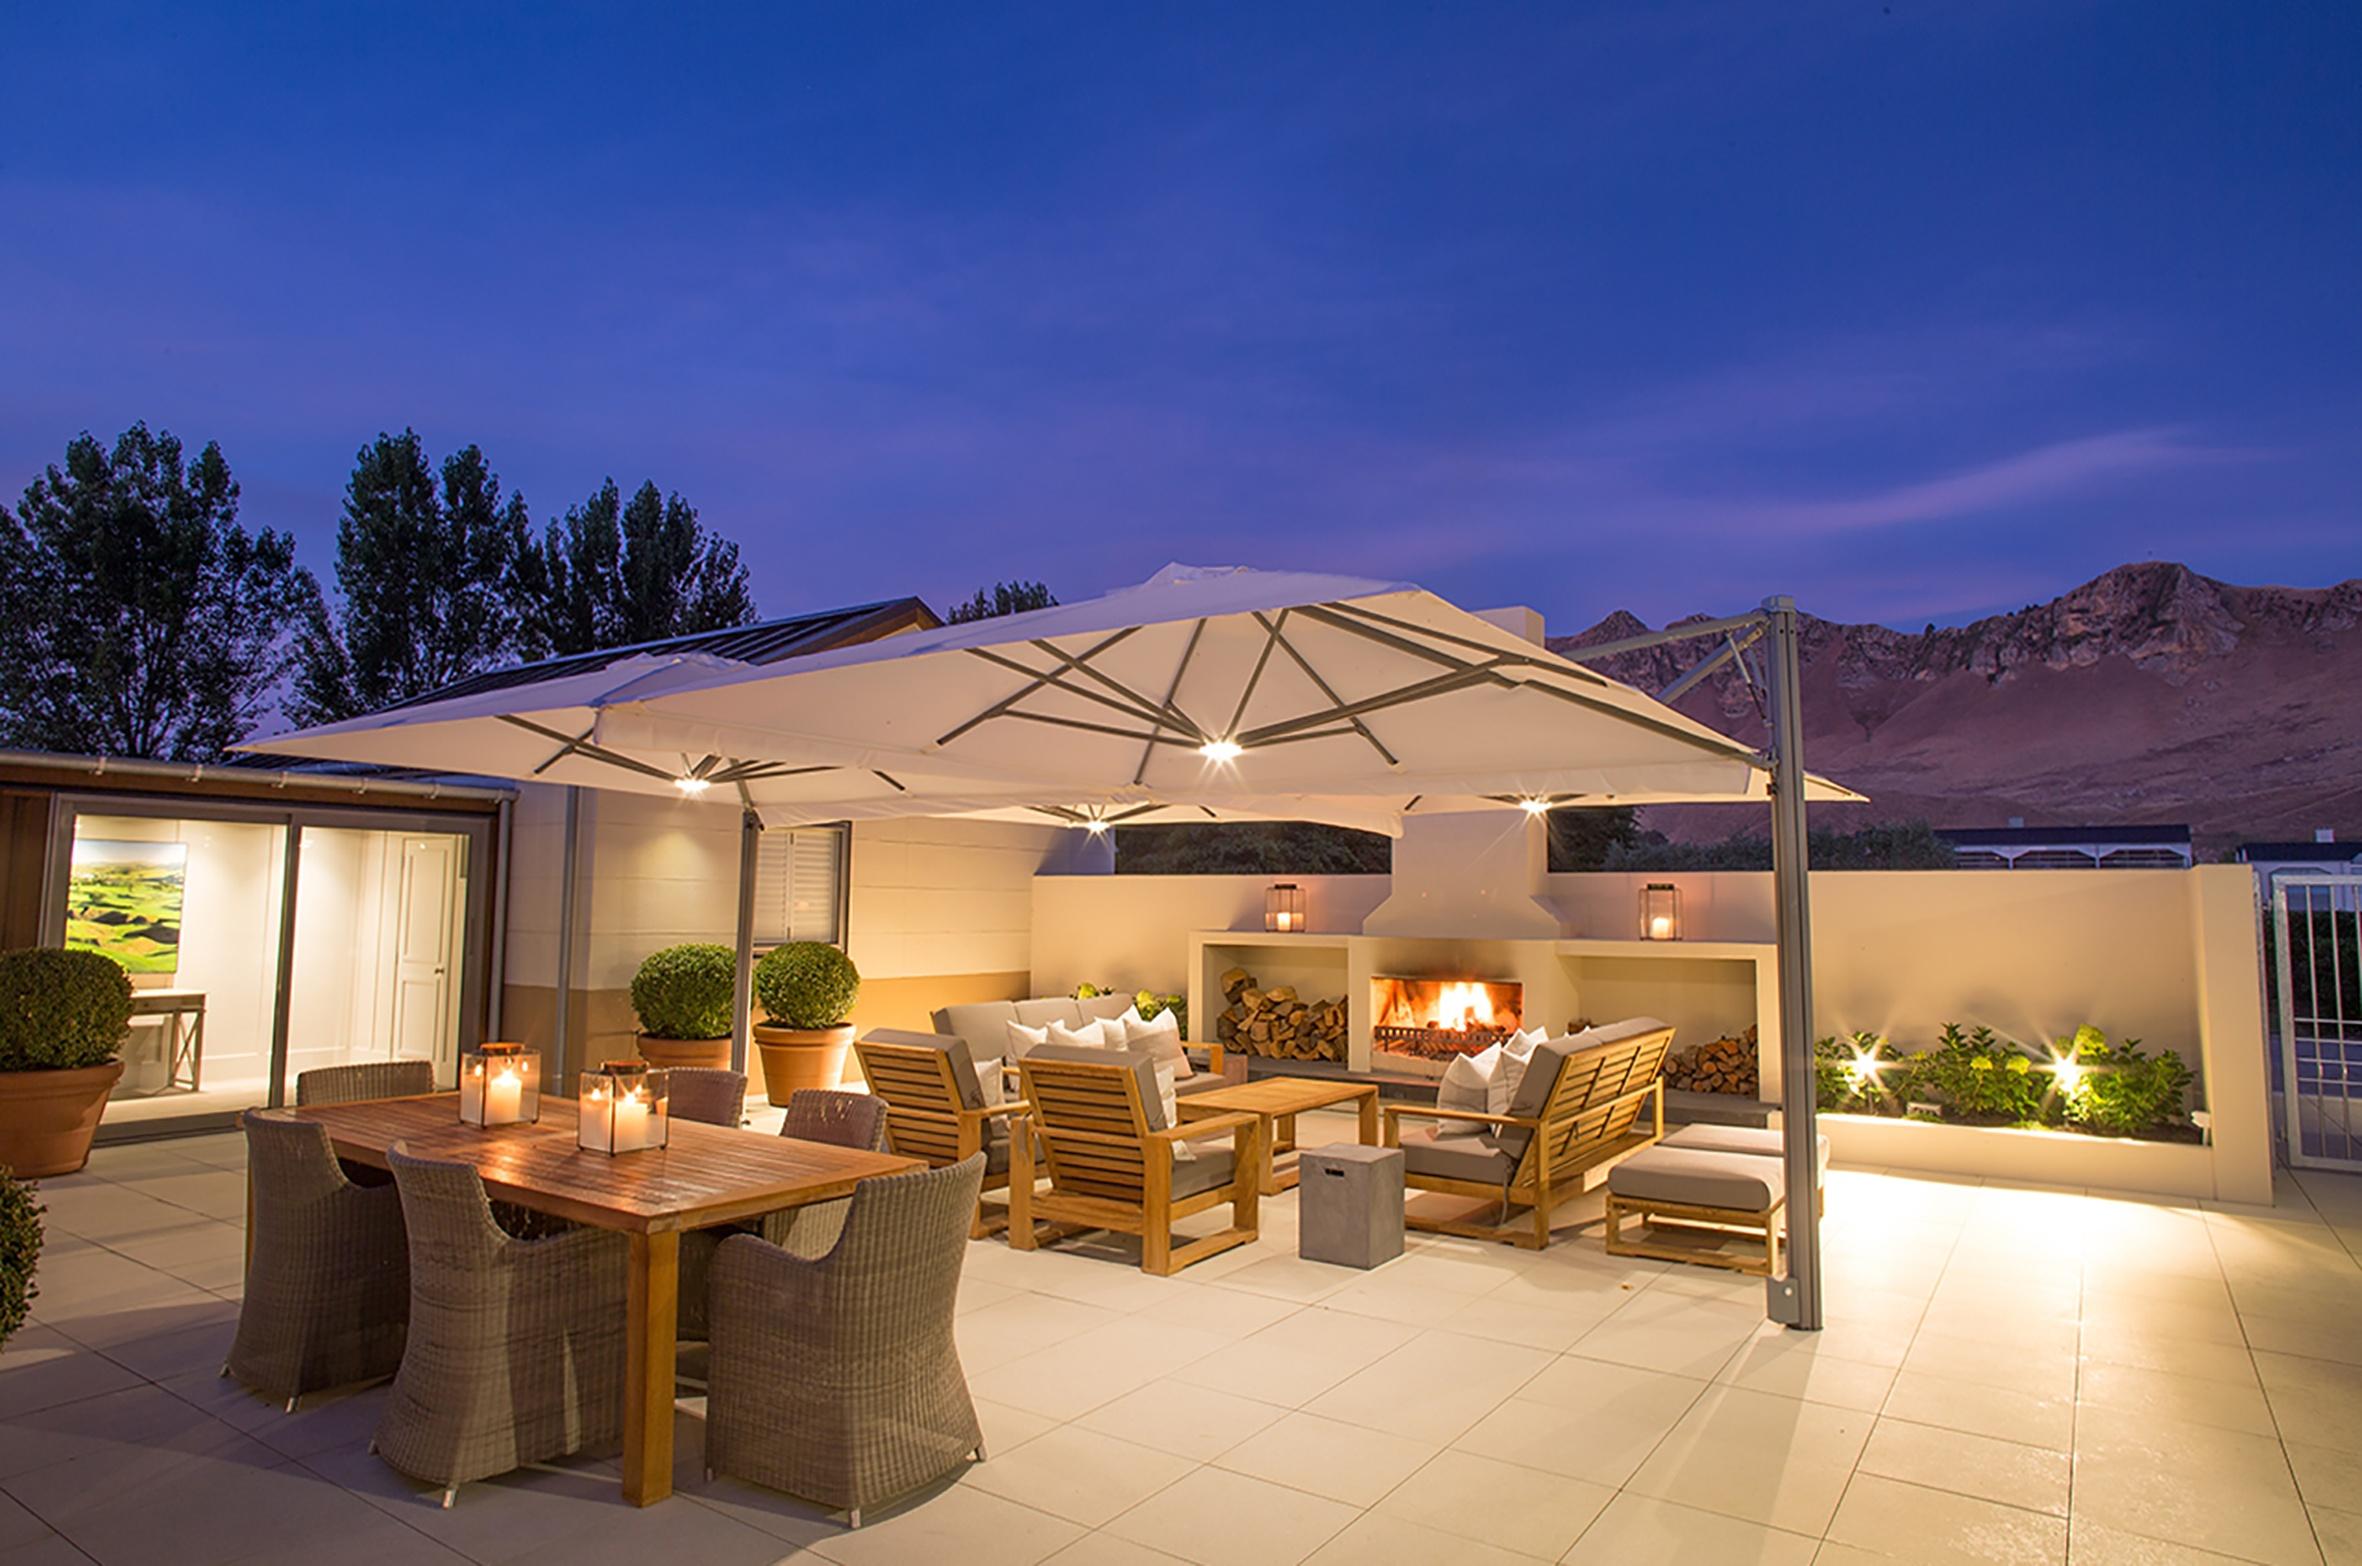 Craggy Range Lodge Courtyard evening-1